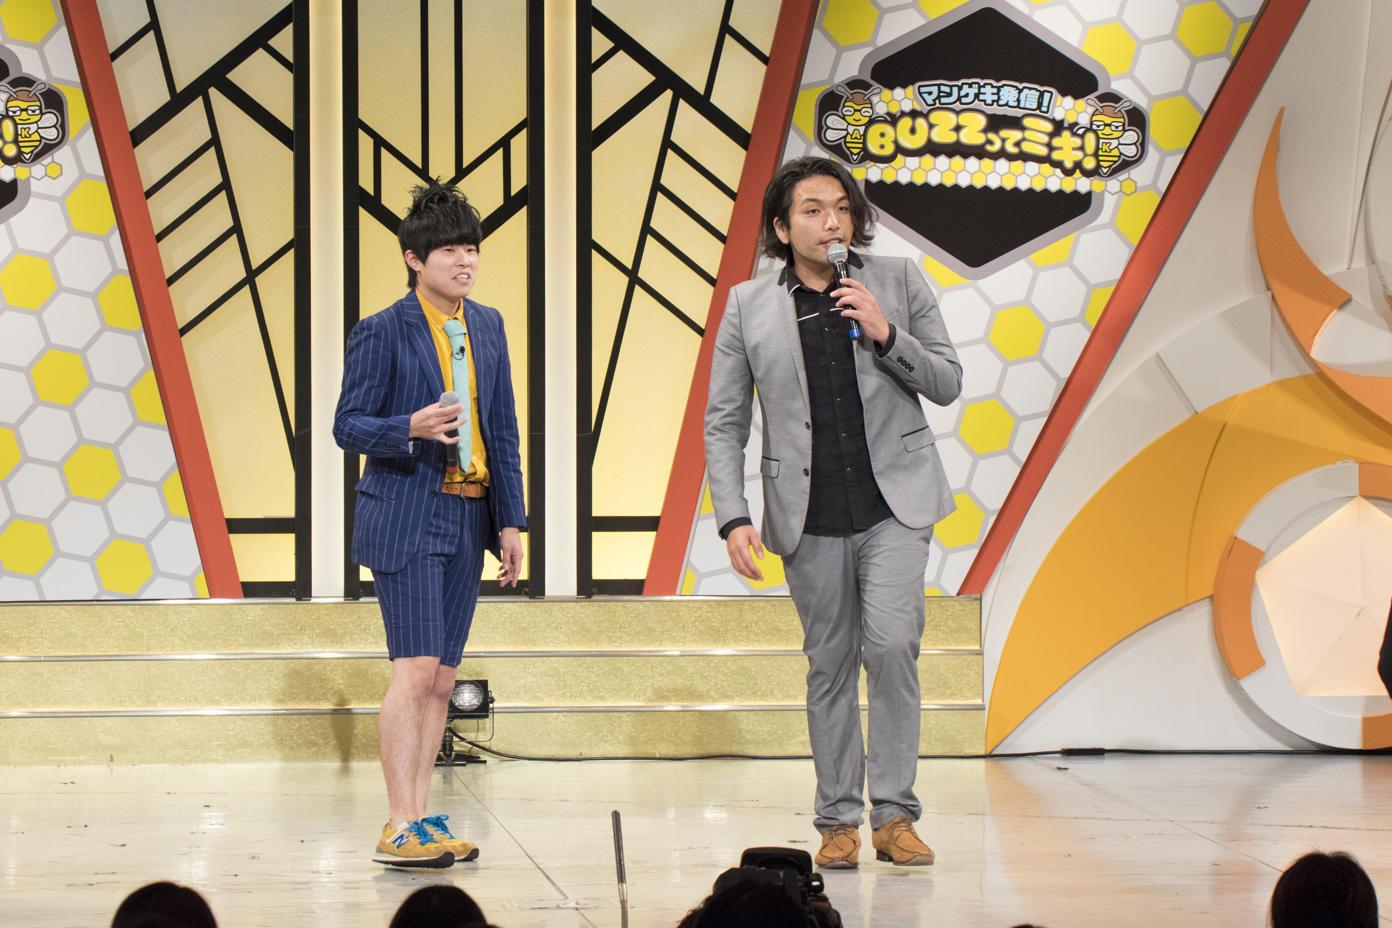 http://news.yoshimoto.co.jp/20170908070105-dff57bee17bb1f5eefeab3eb58e5bbac306d54d3.jpg